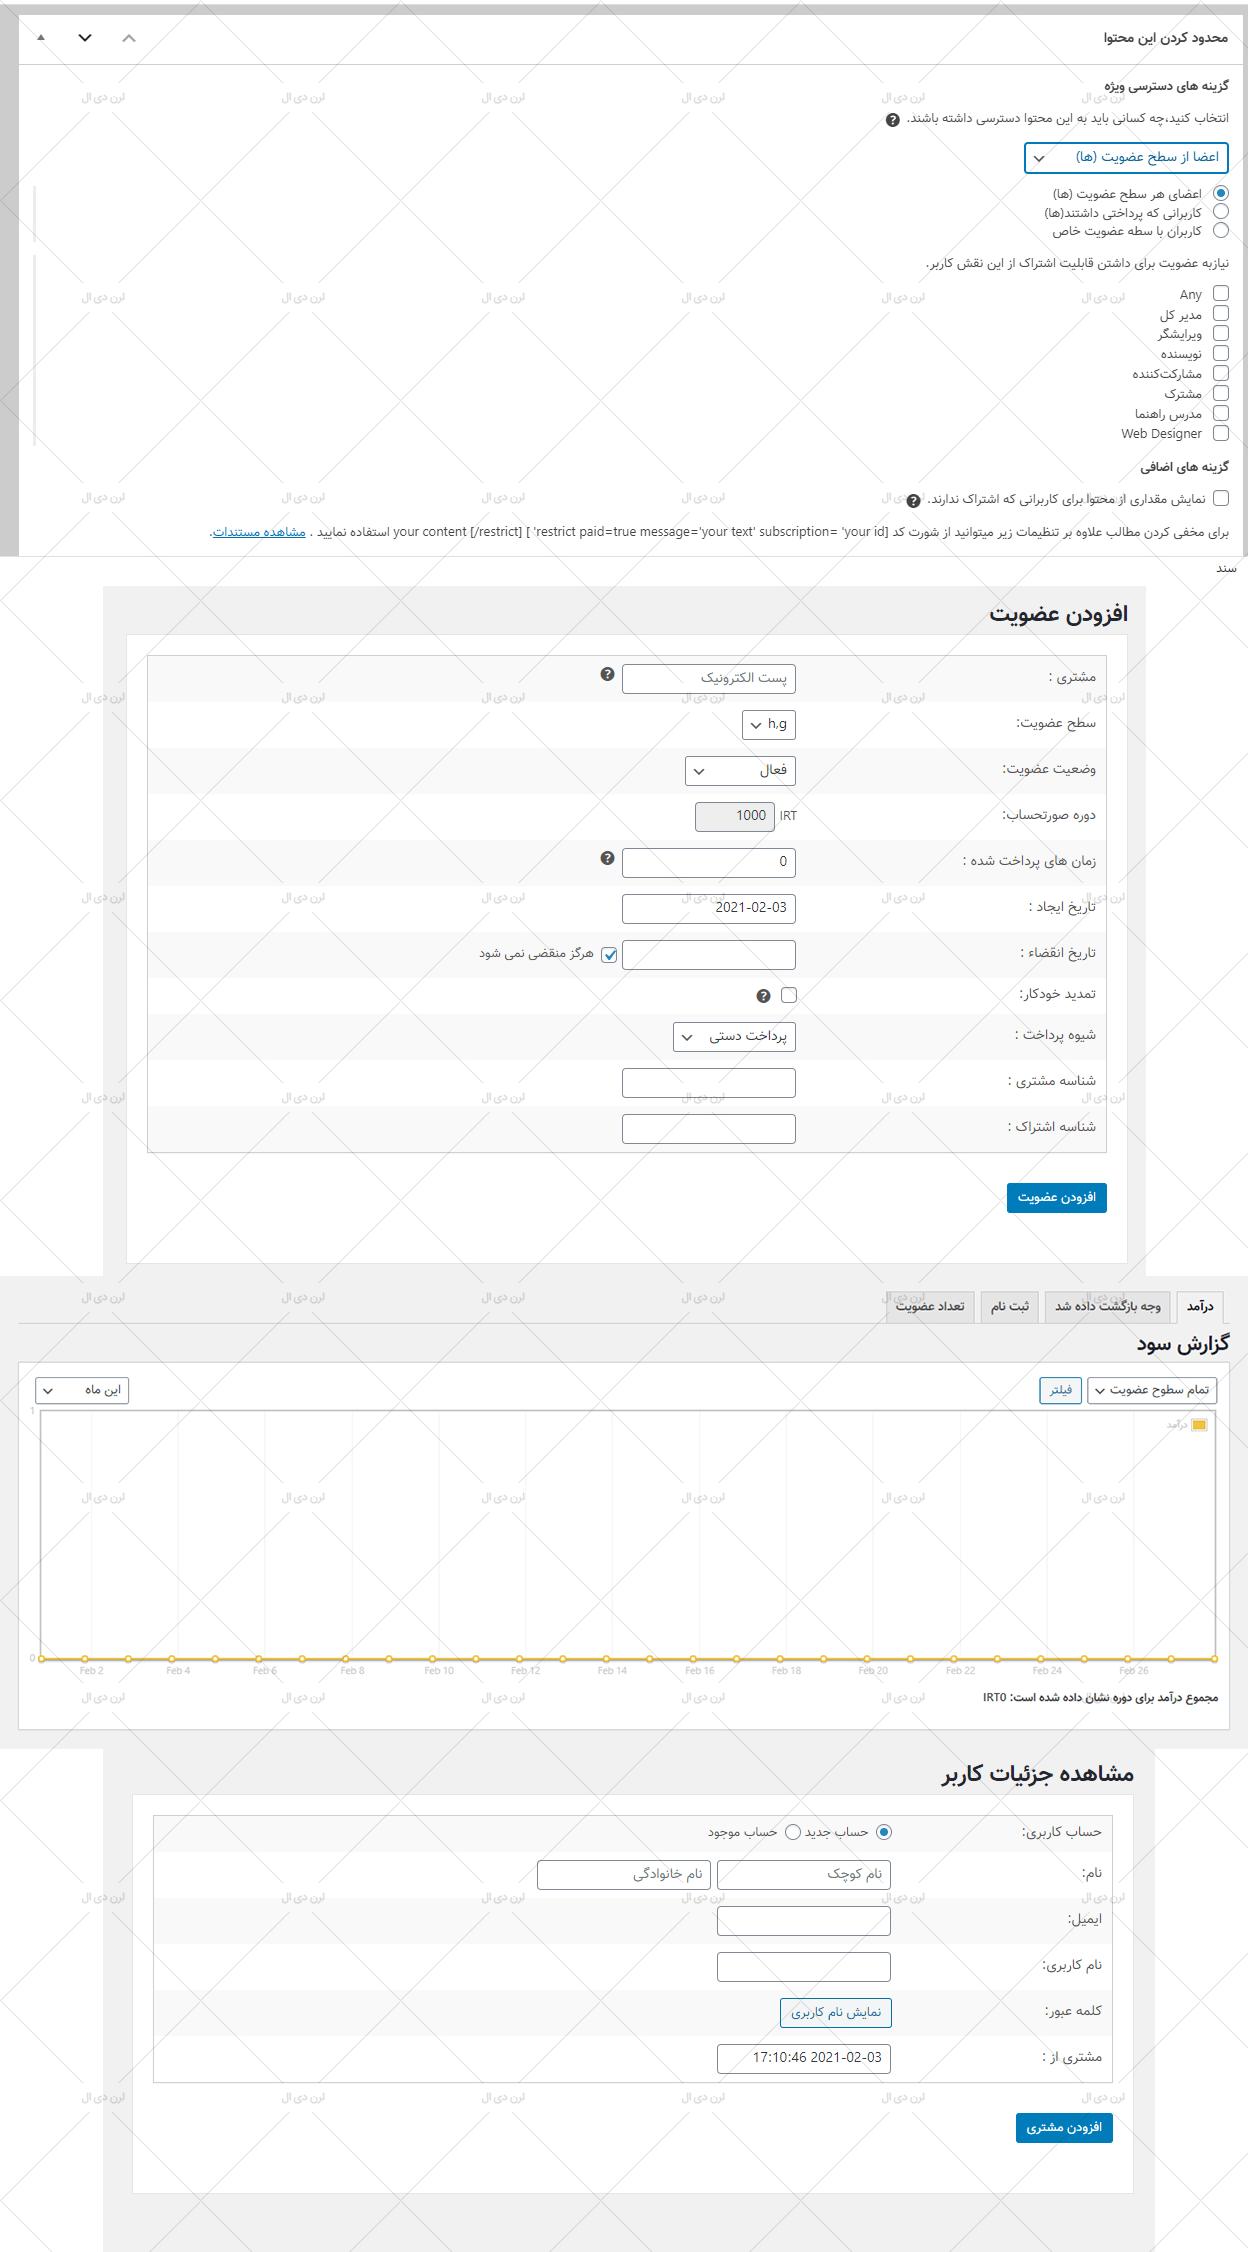 افزونه فارسی Restrict Content Pro